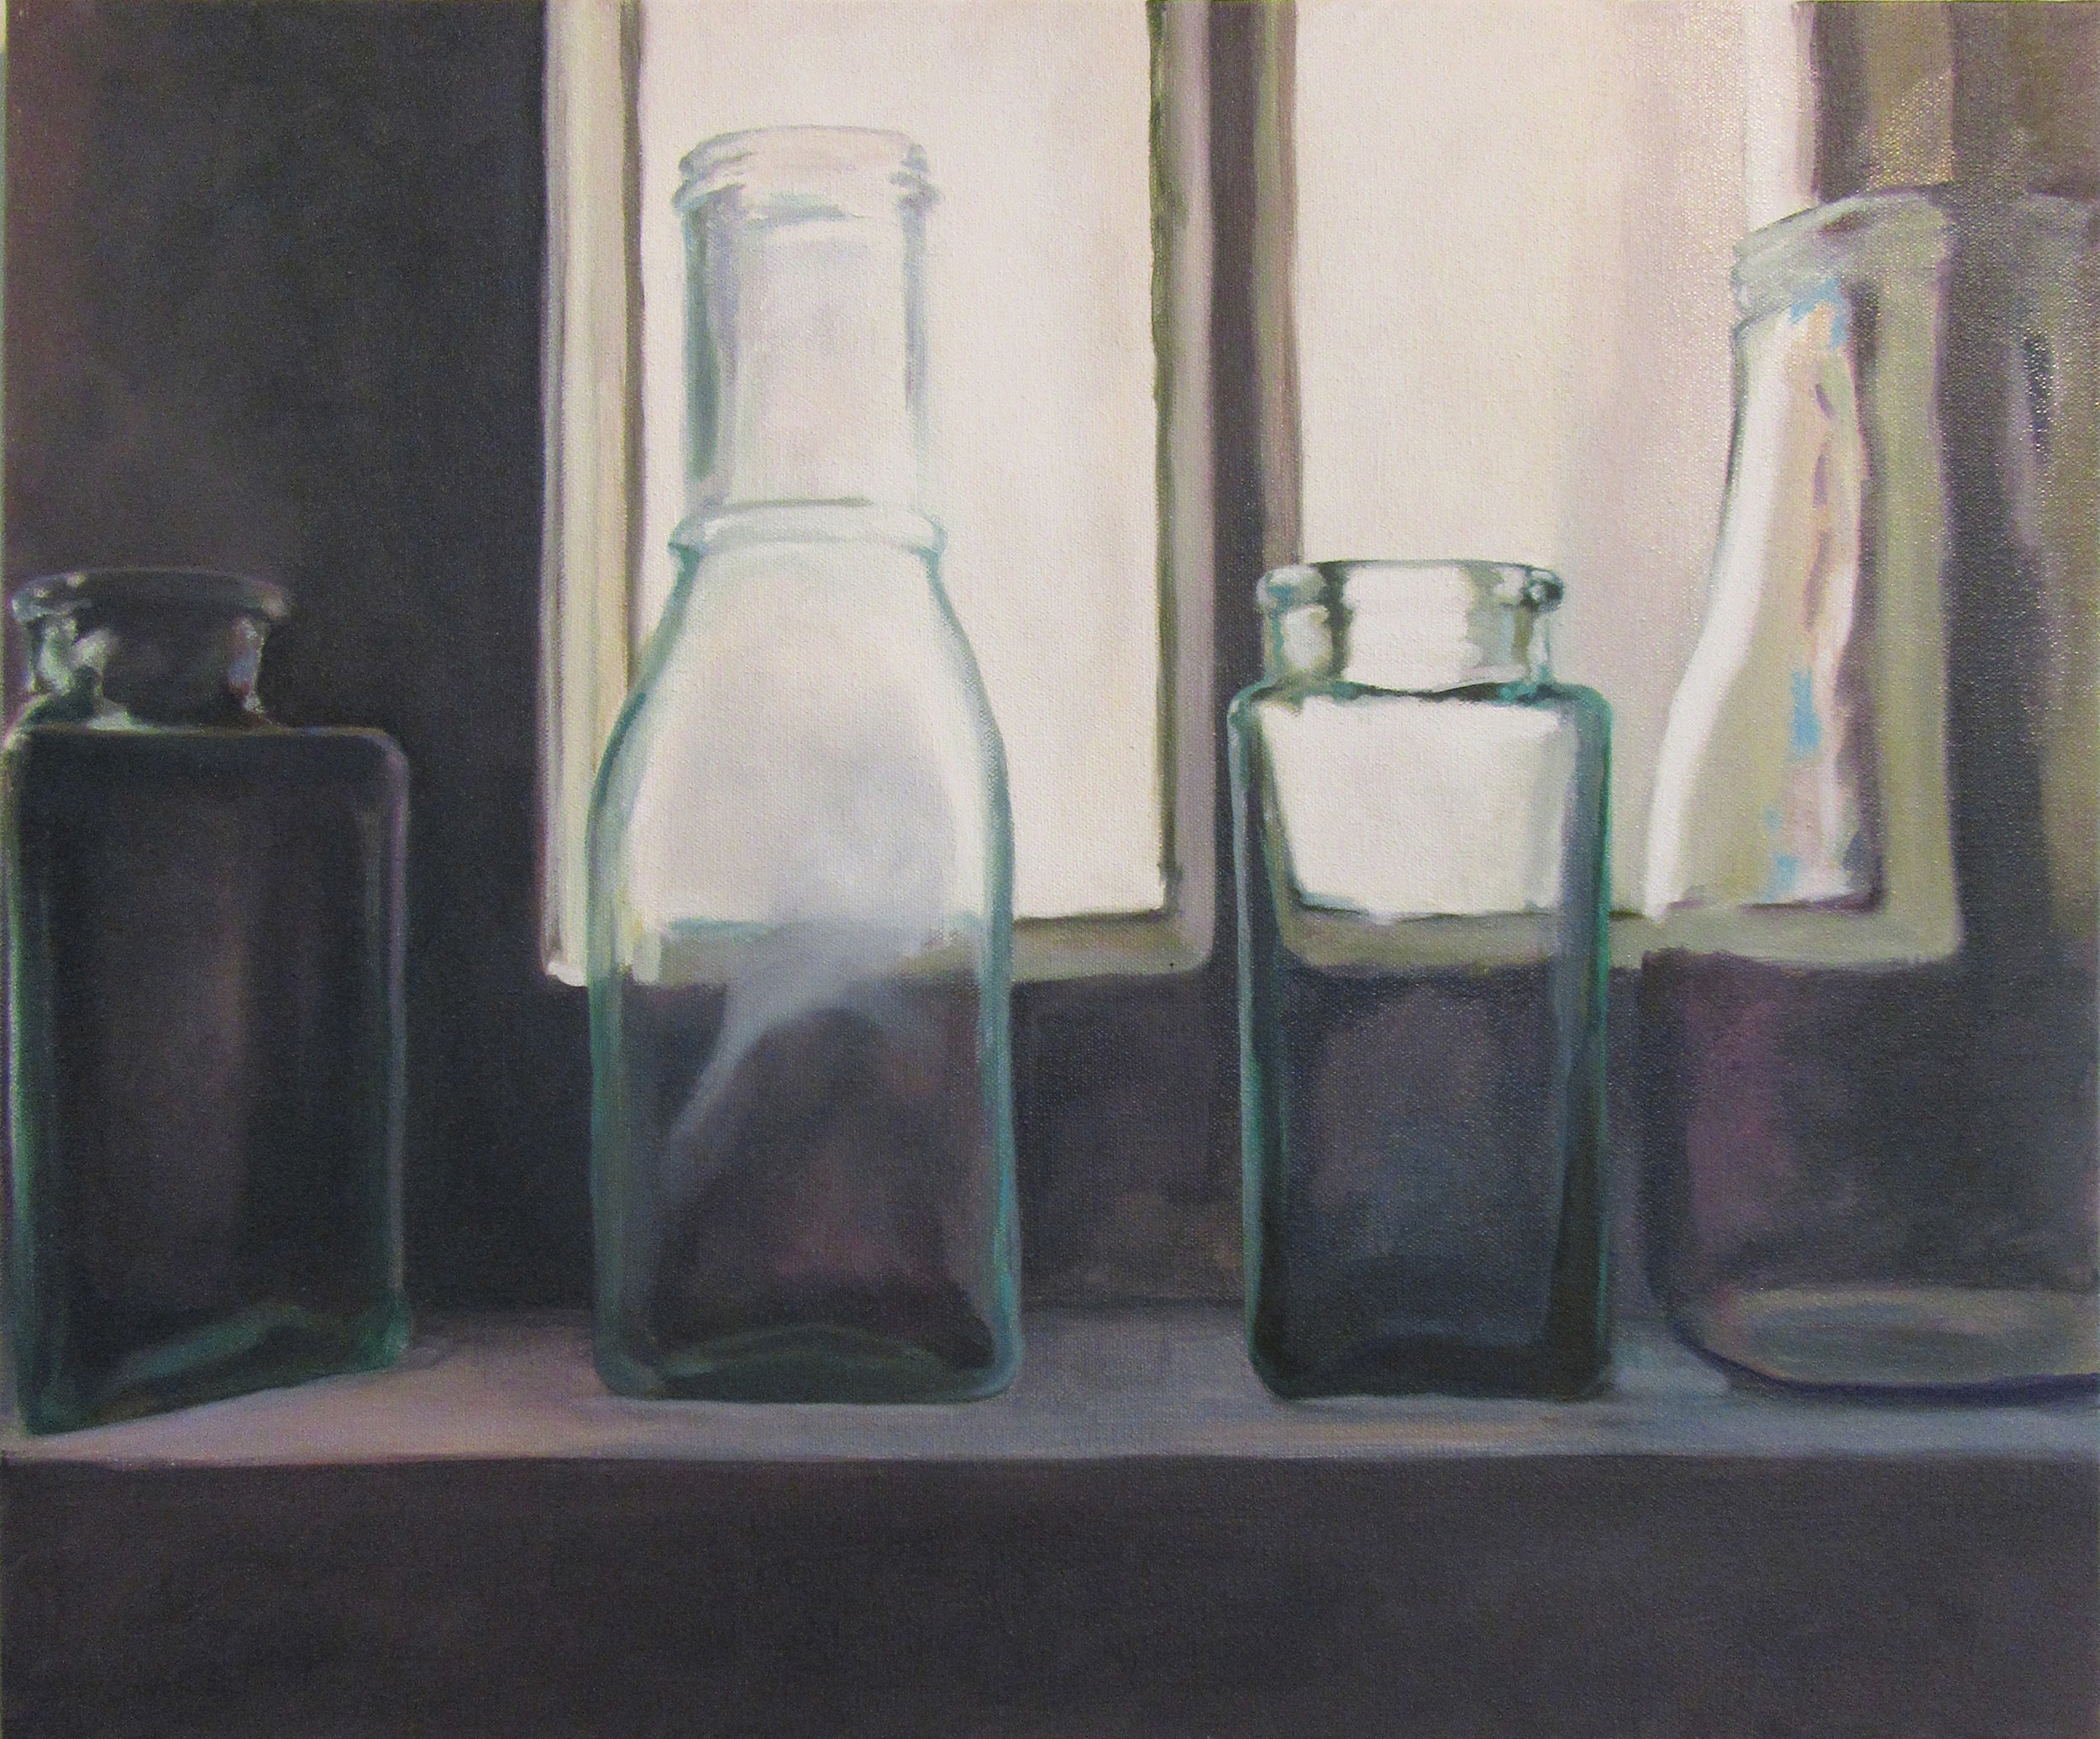 Bottles in Black